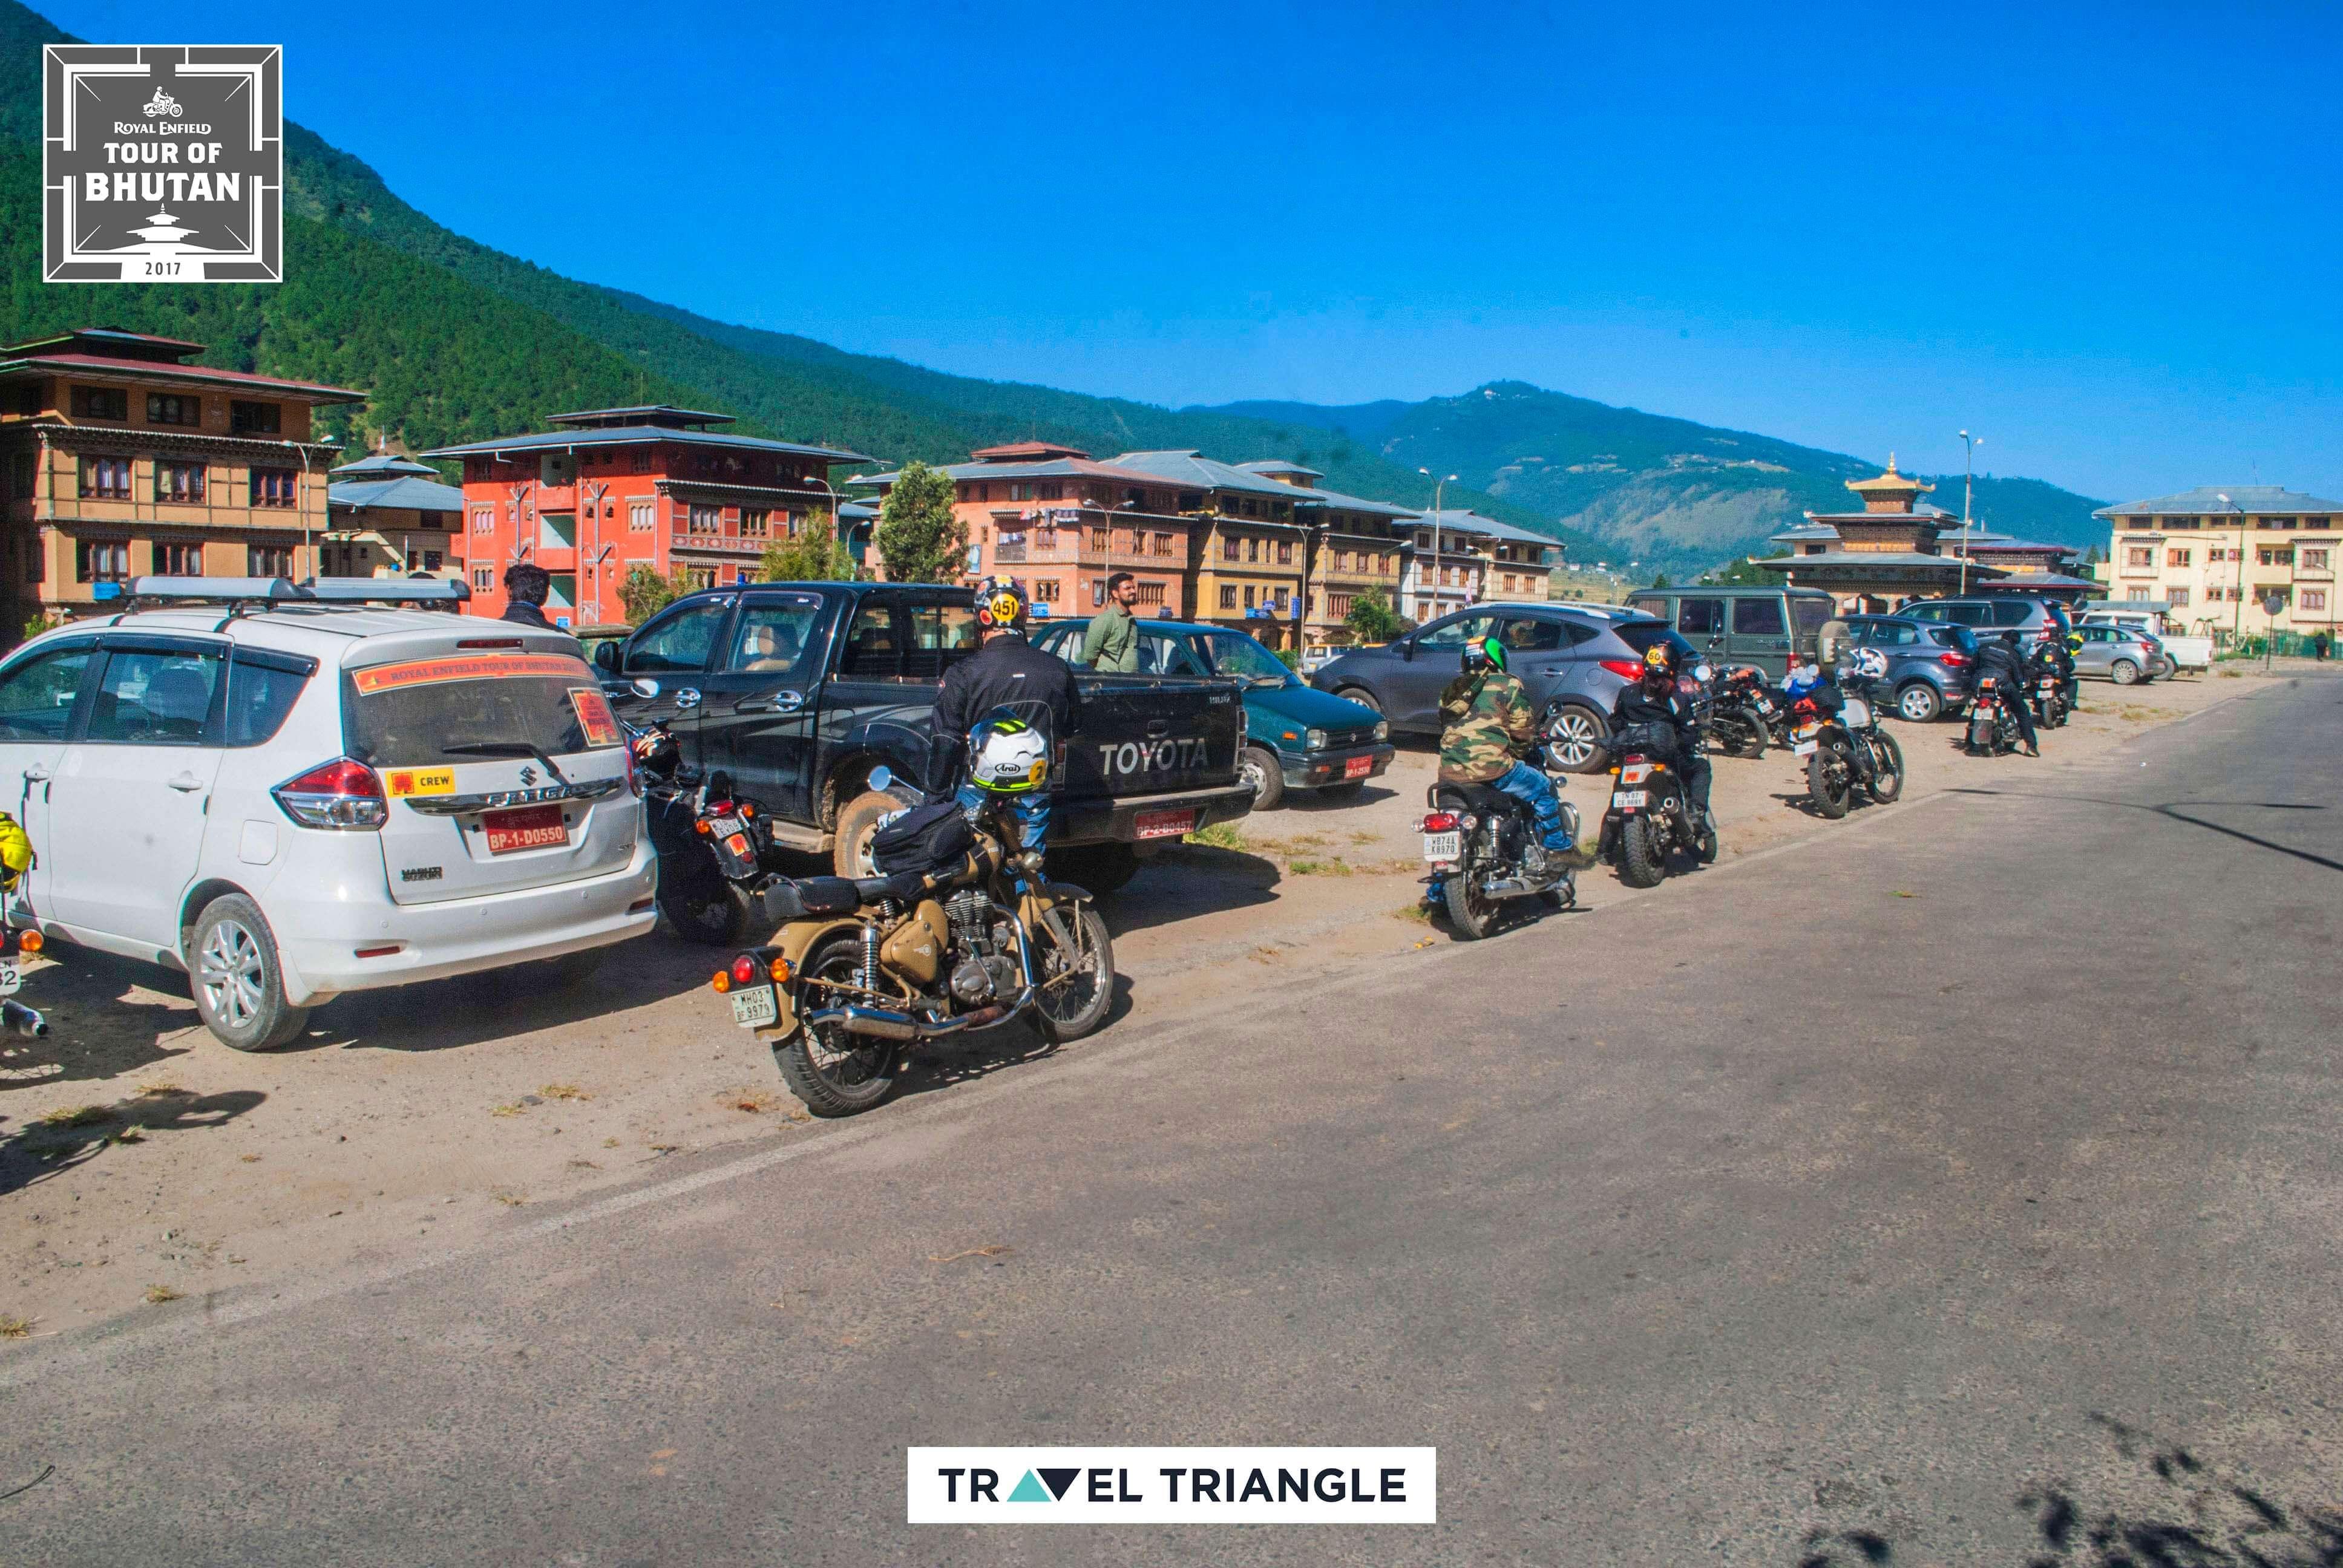 Punakha to Phobjikha: riding through the town of punakha